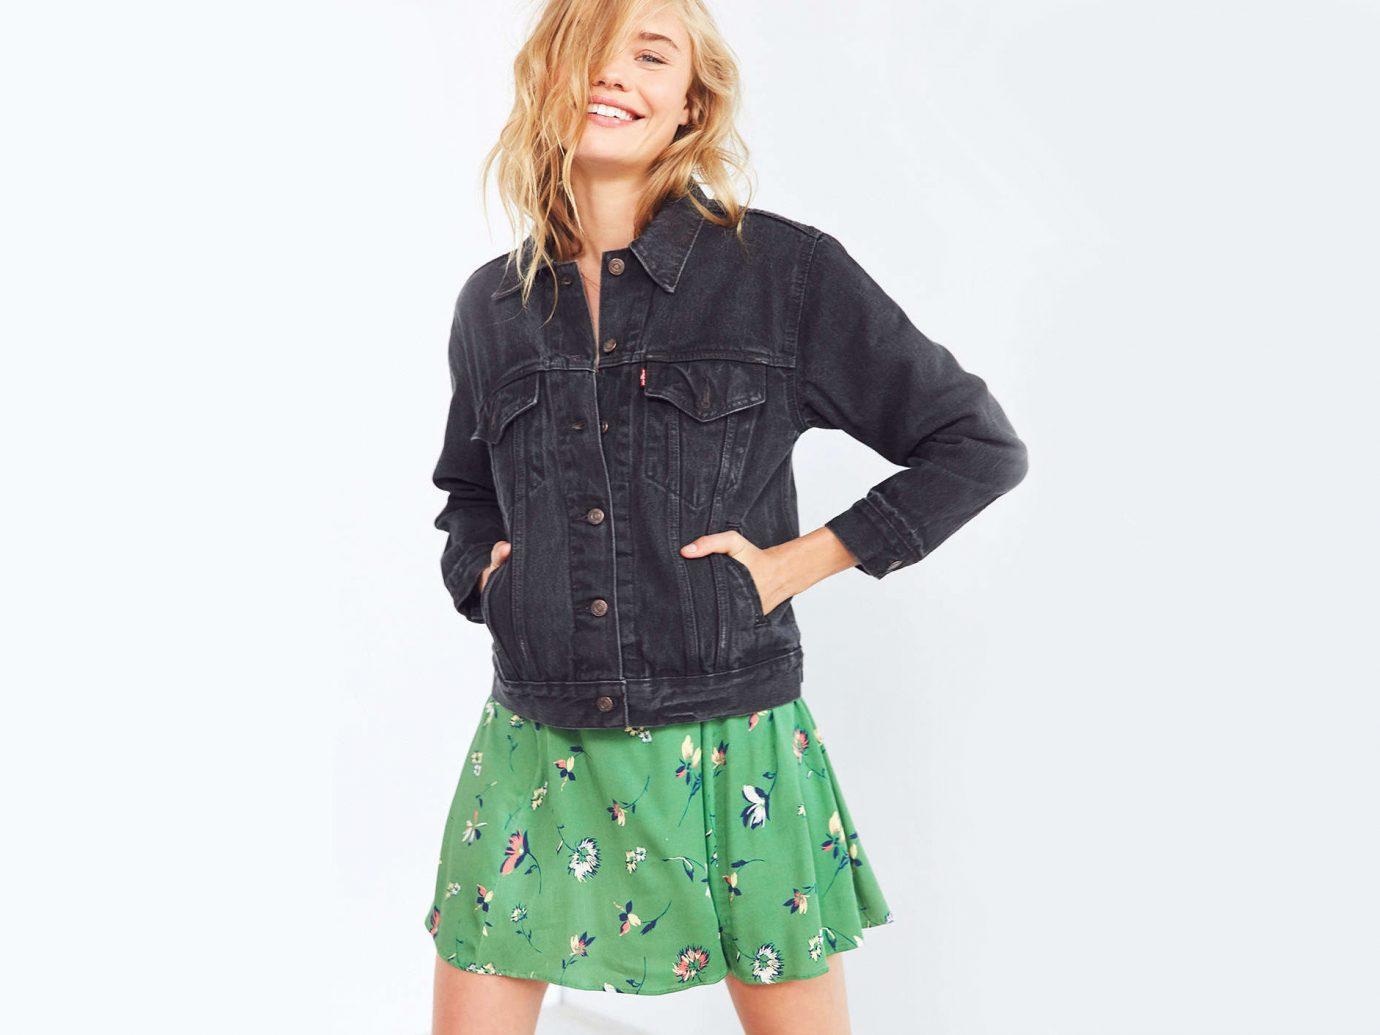 Style + Design clothing person sleeve fashion fashion model jacket waist denim pattern button jeans day dress